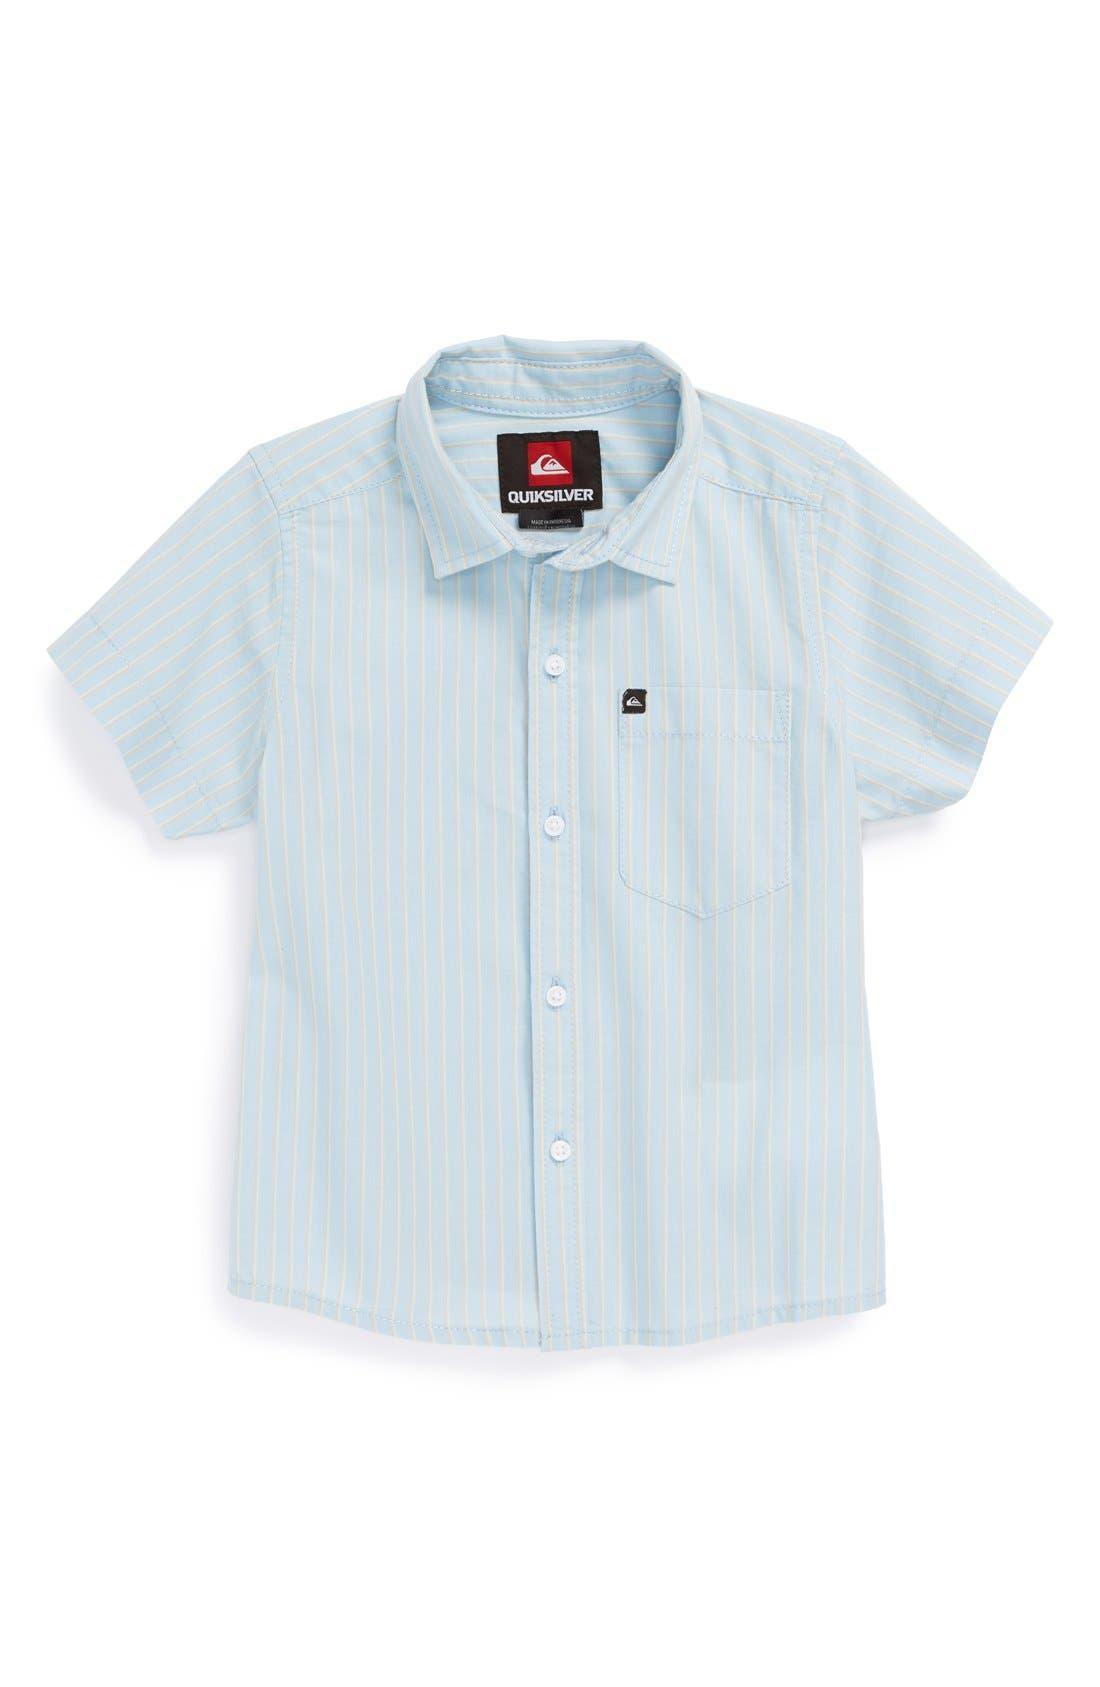 Main Image - Quiksilver 'Barracuda Cay' Short Sleeve Woven Shirt (Little Boys & Big Boys)